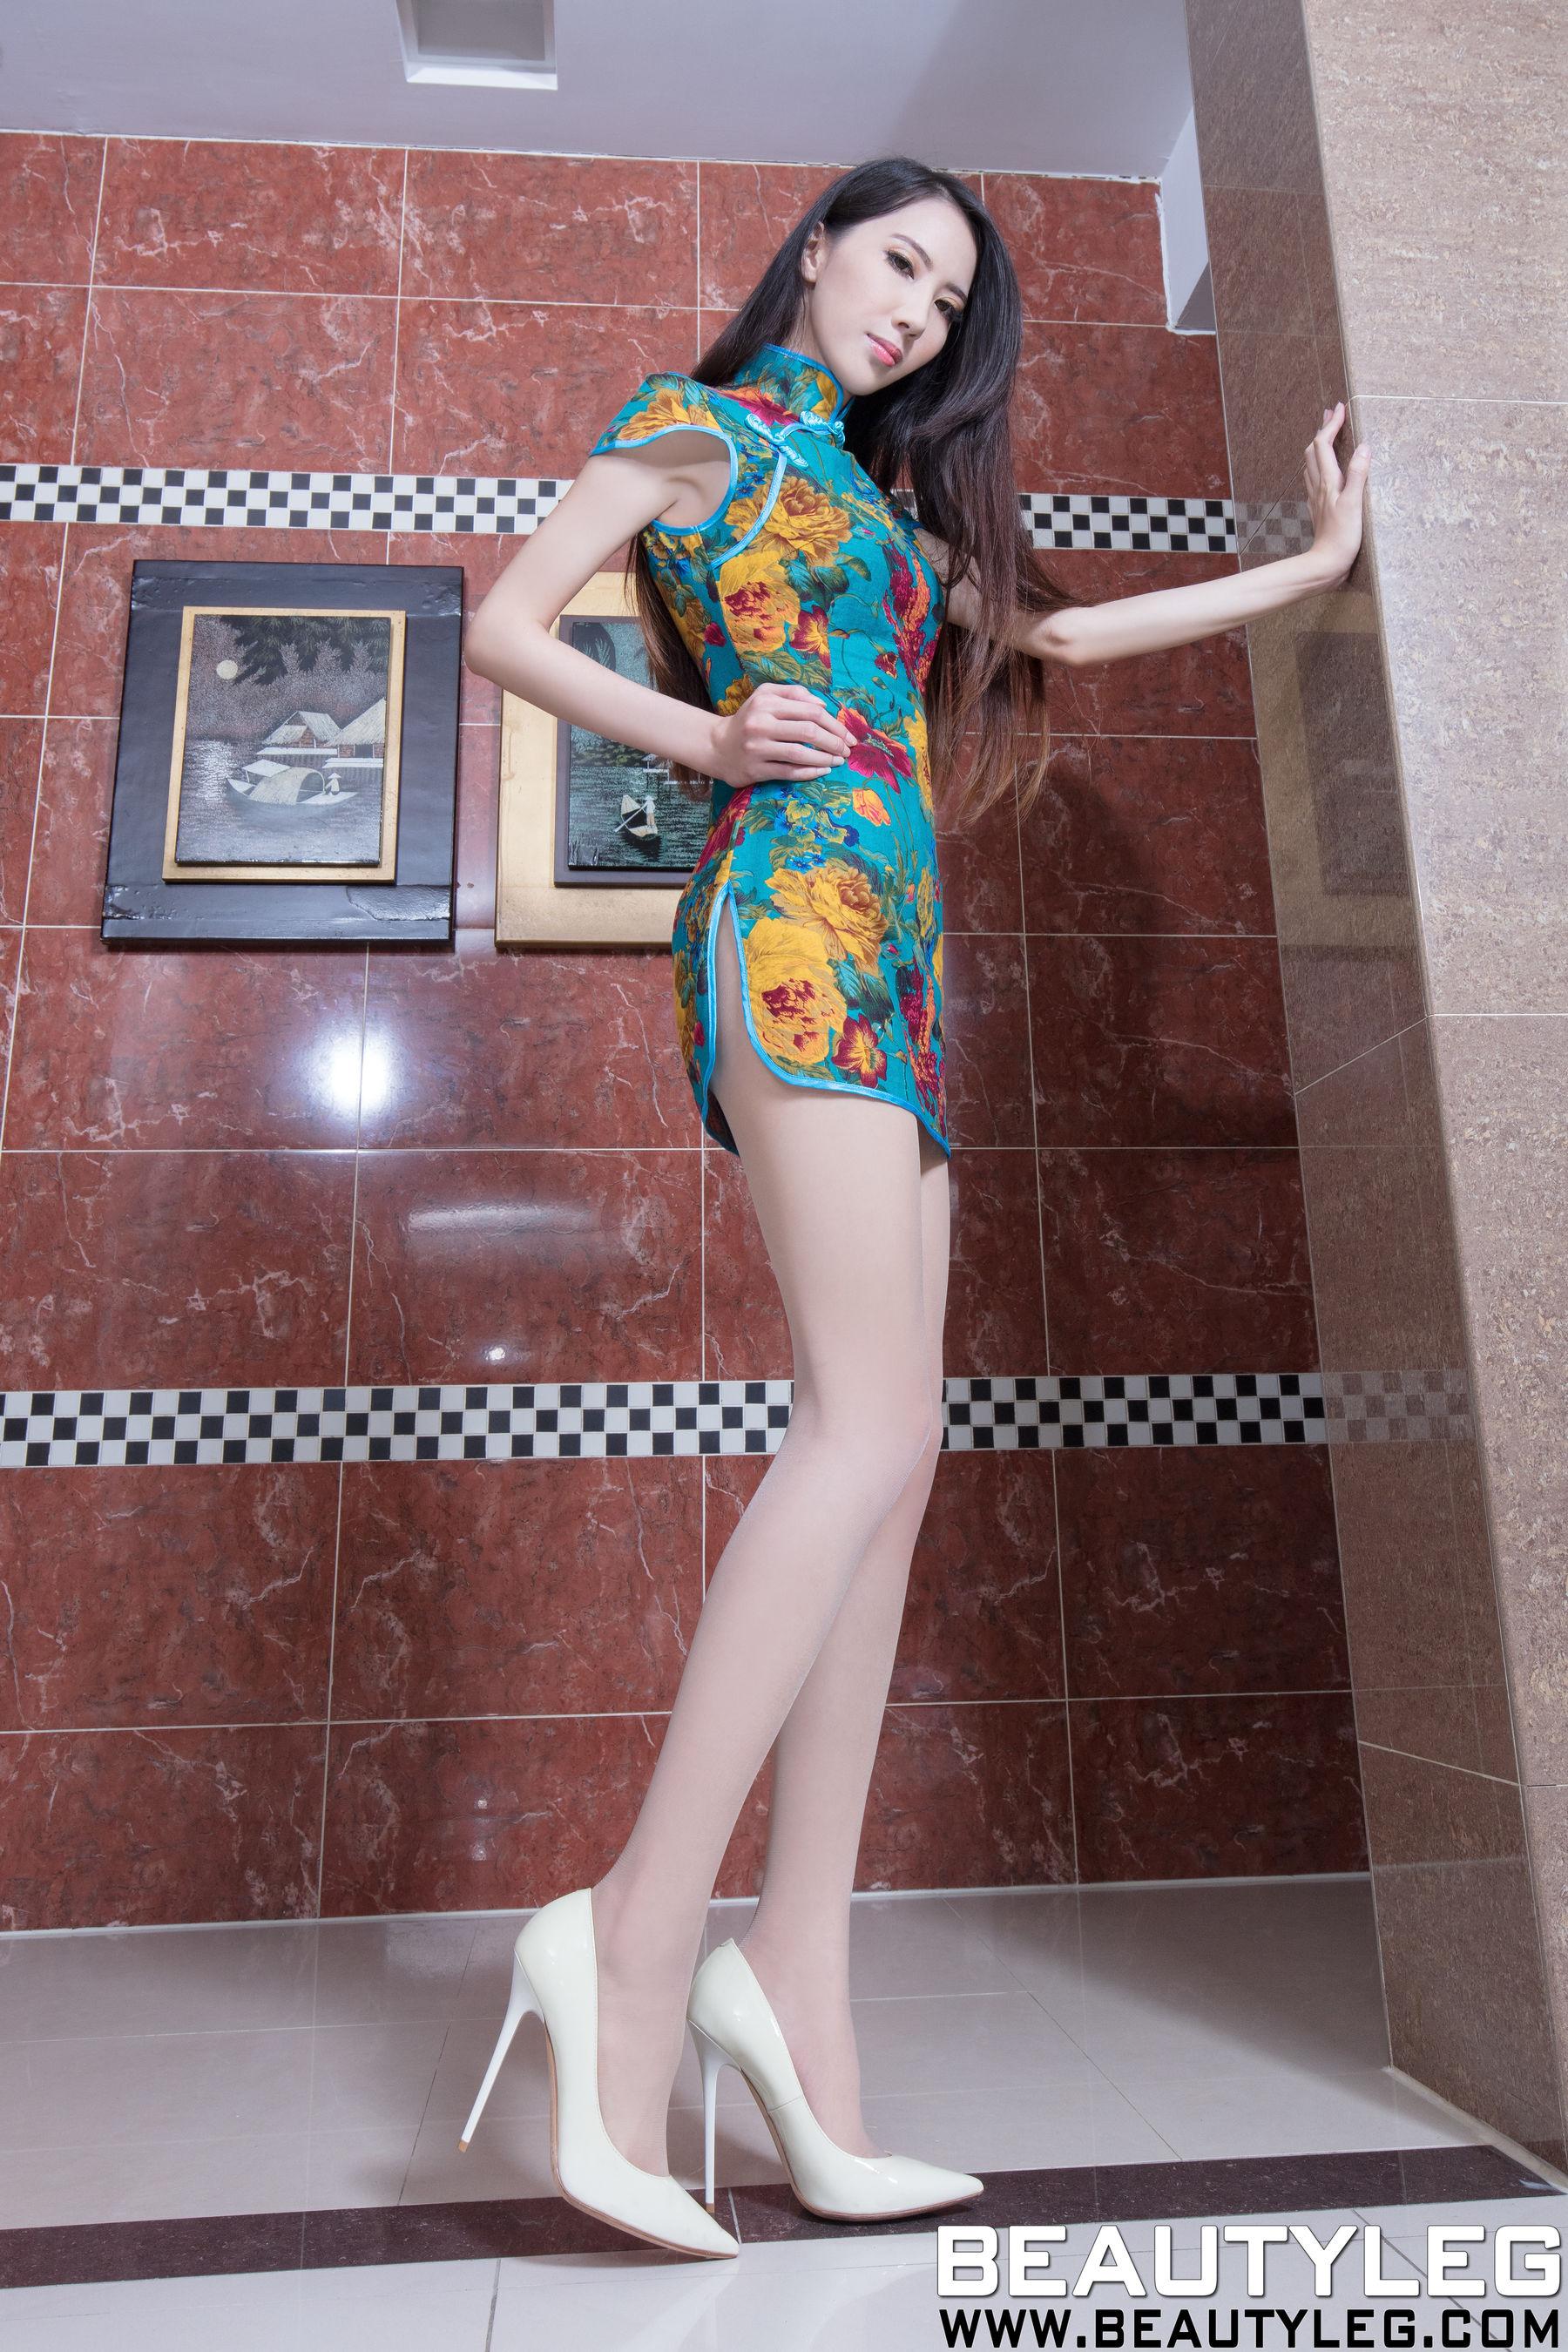 VOL.548 [Beautyleg]美腿丝袜美腿高跟:童采萱(Beautyleg Yoyo,腿模Yoyo)超高清个人性感漂亮大图(52P)